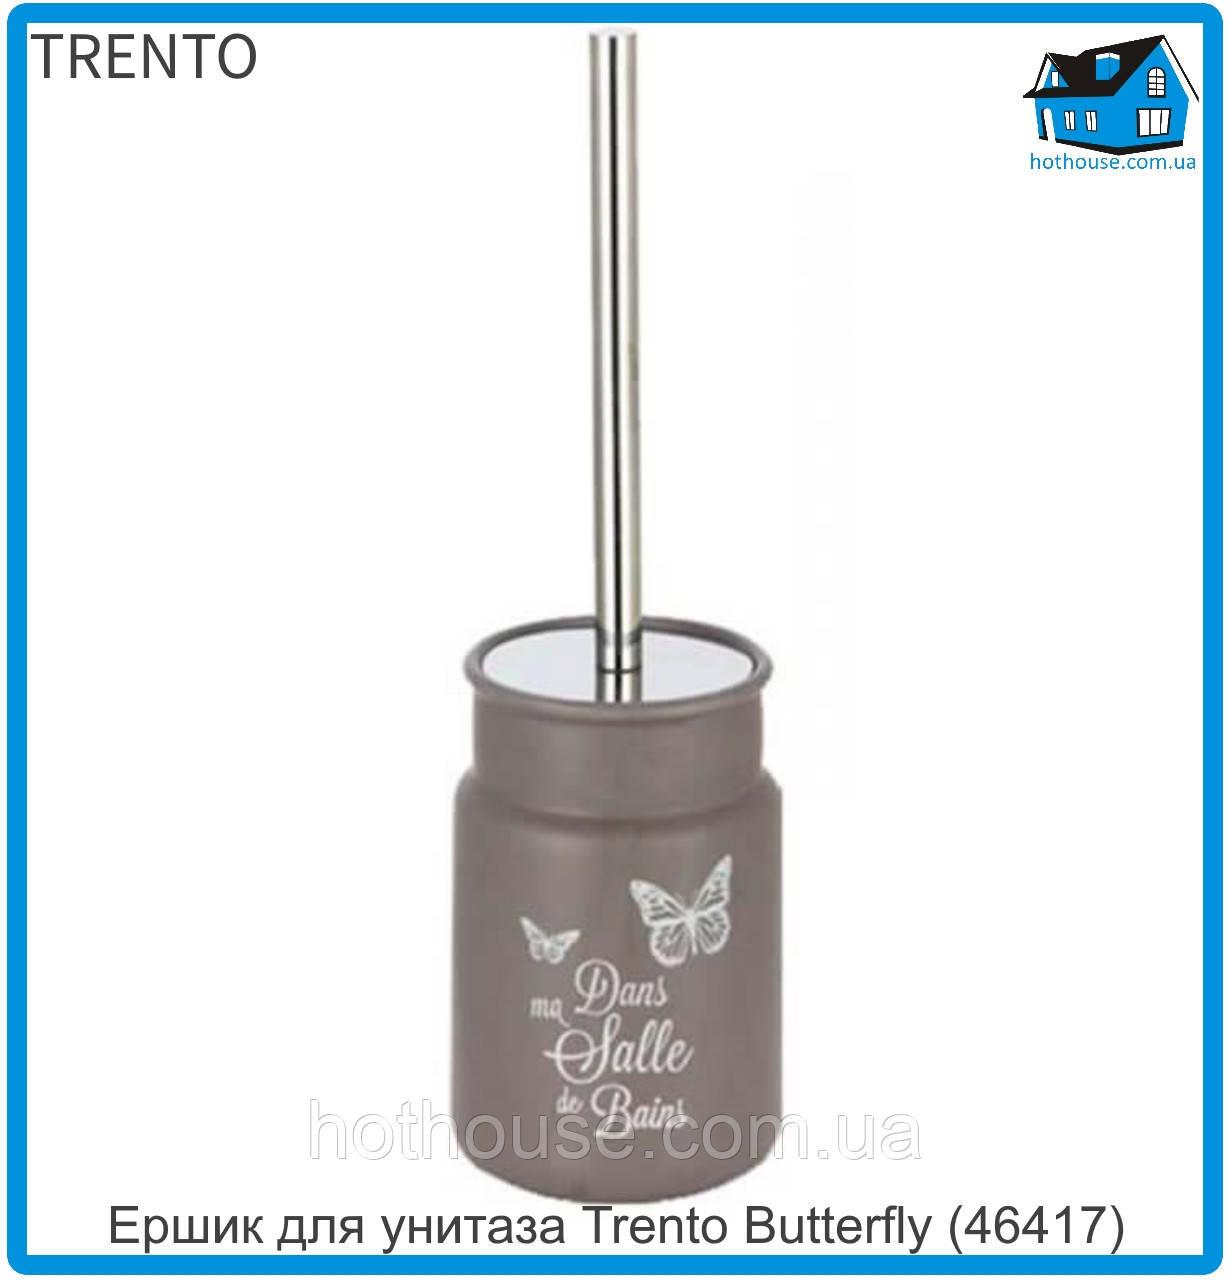 Ершик для унитаза Trento Butterfly (46417)